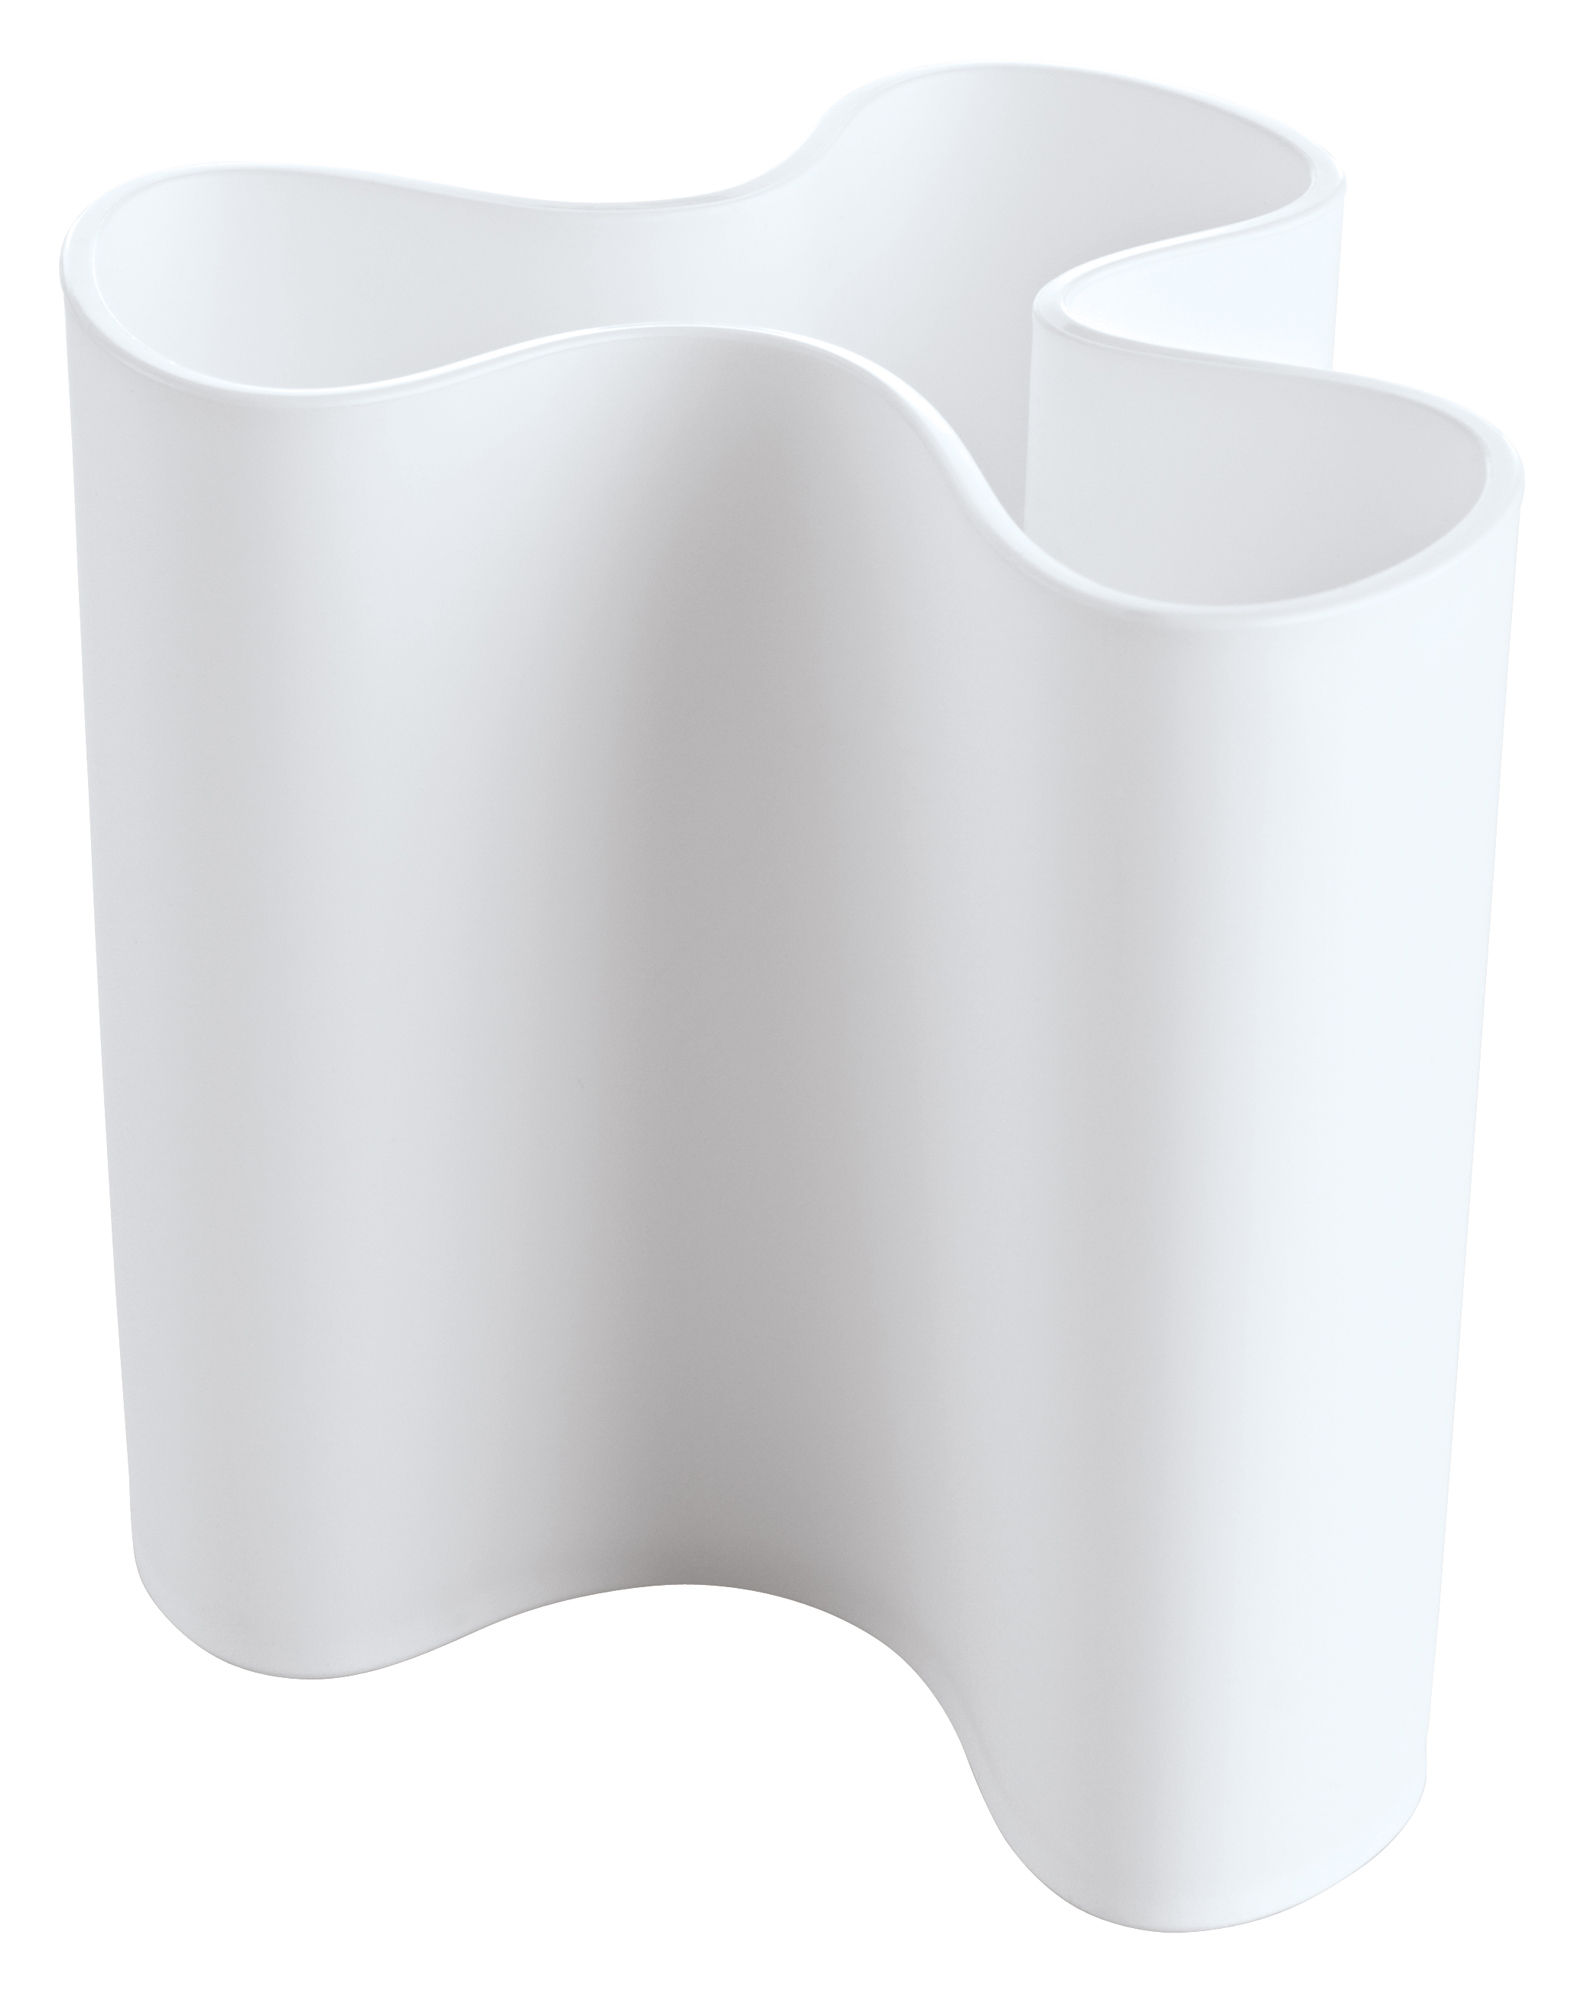 Interni - Vasi - Vaso Clara di Koziol - Bianco - Materiale plastico